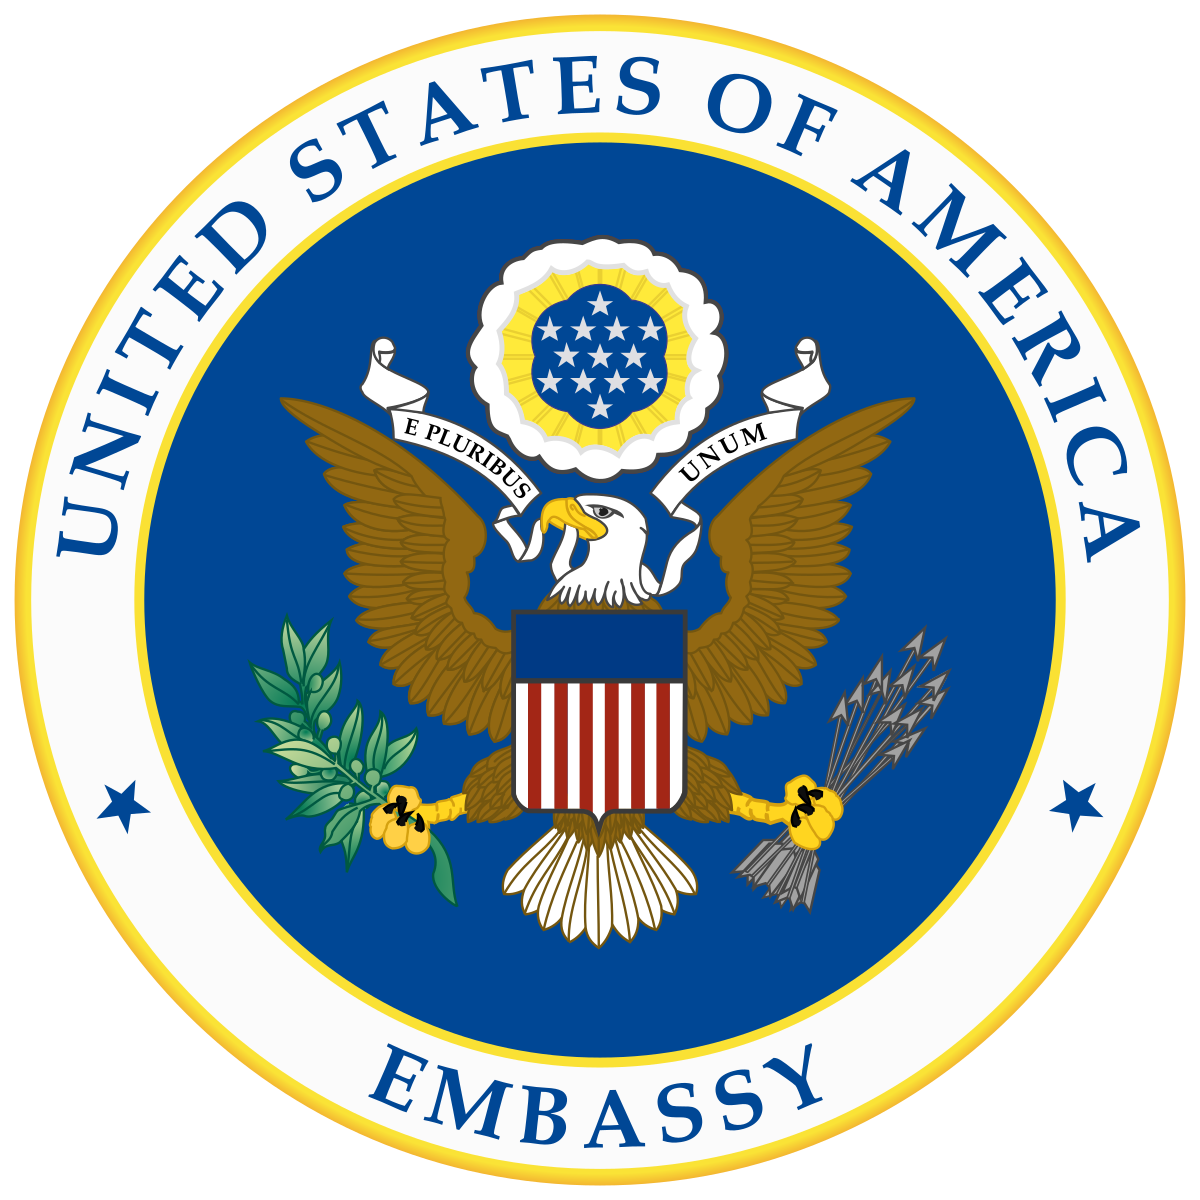 HLABと米国大使館が連携、自宅にいながら「留学」と「リベラルアーツ」が体験できるオンラインプログラムを中高生向けに開催